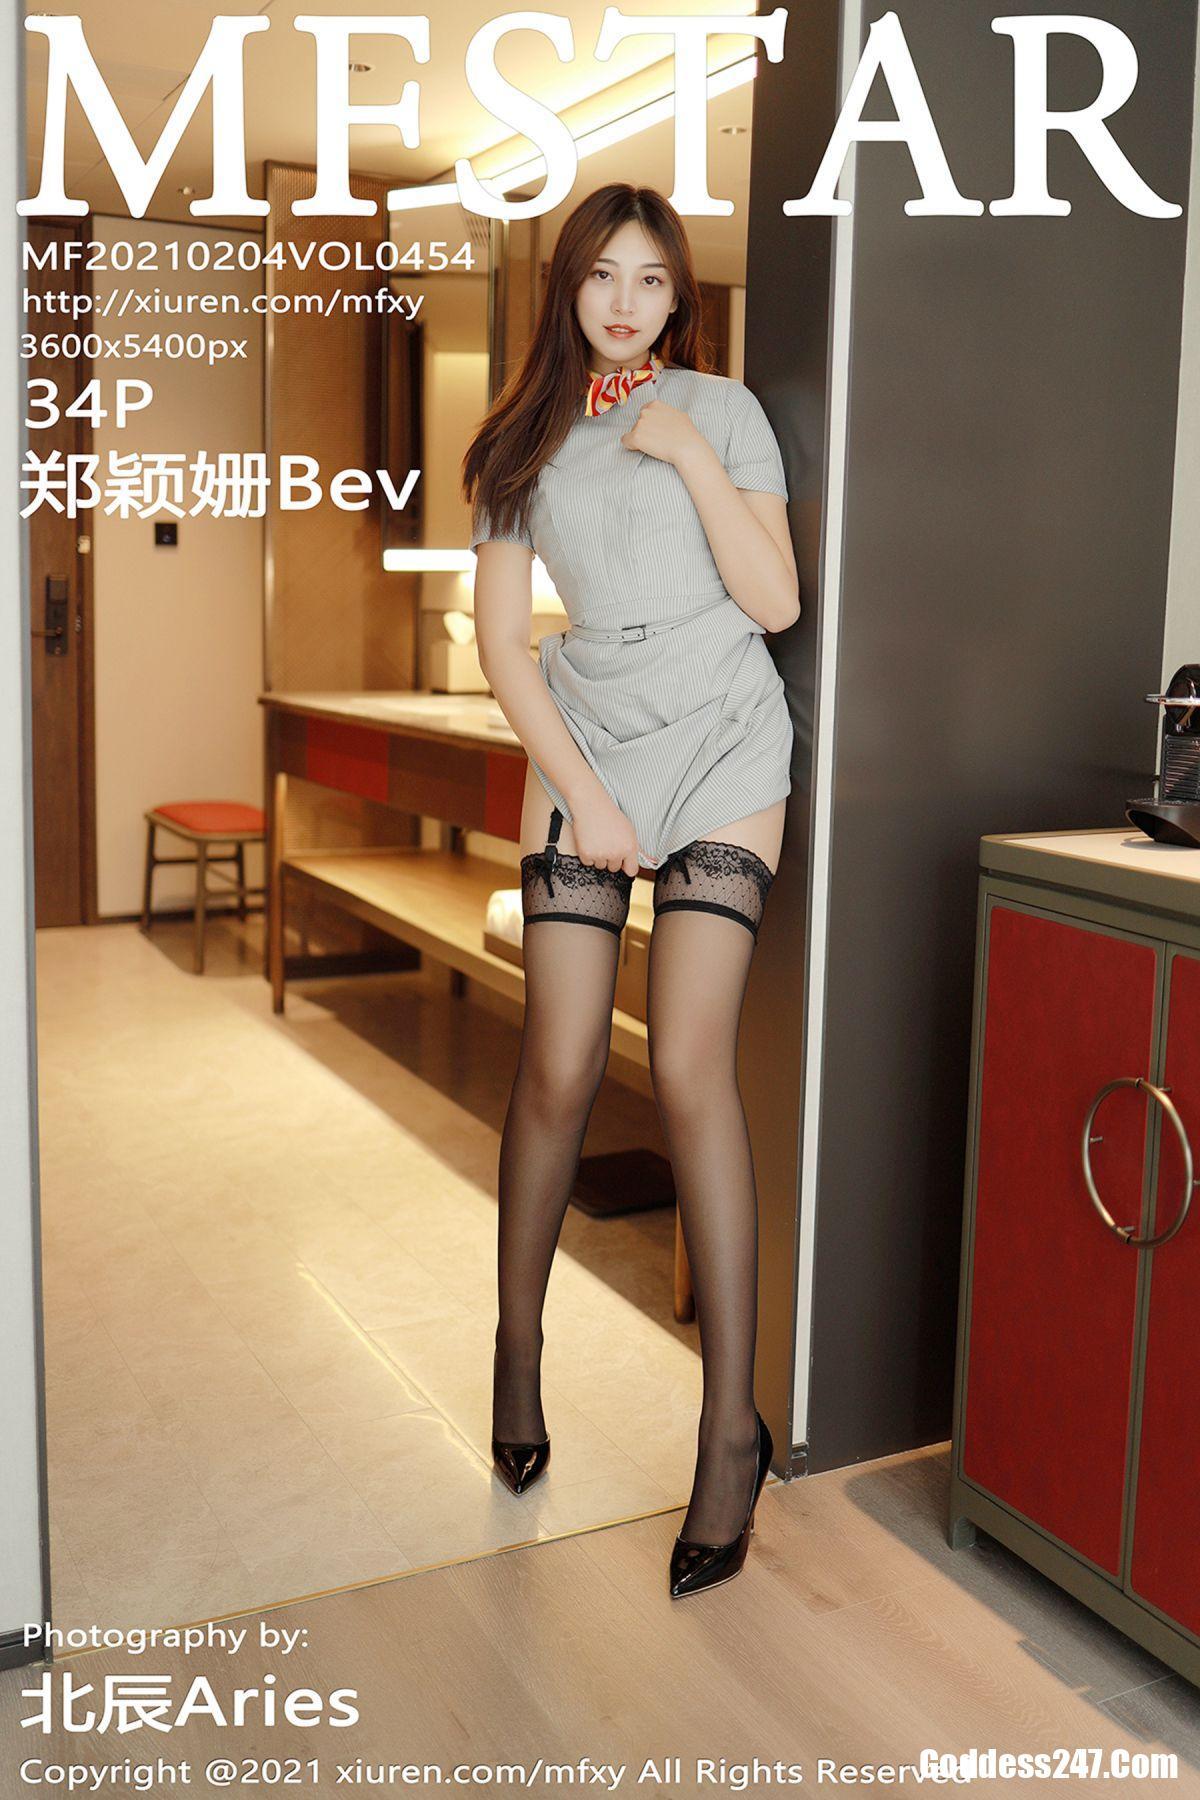 MFStar模范学院 Vol.454 郑颖姗Bev